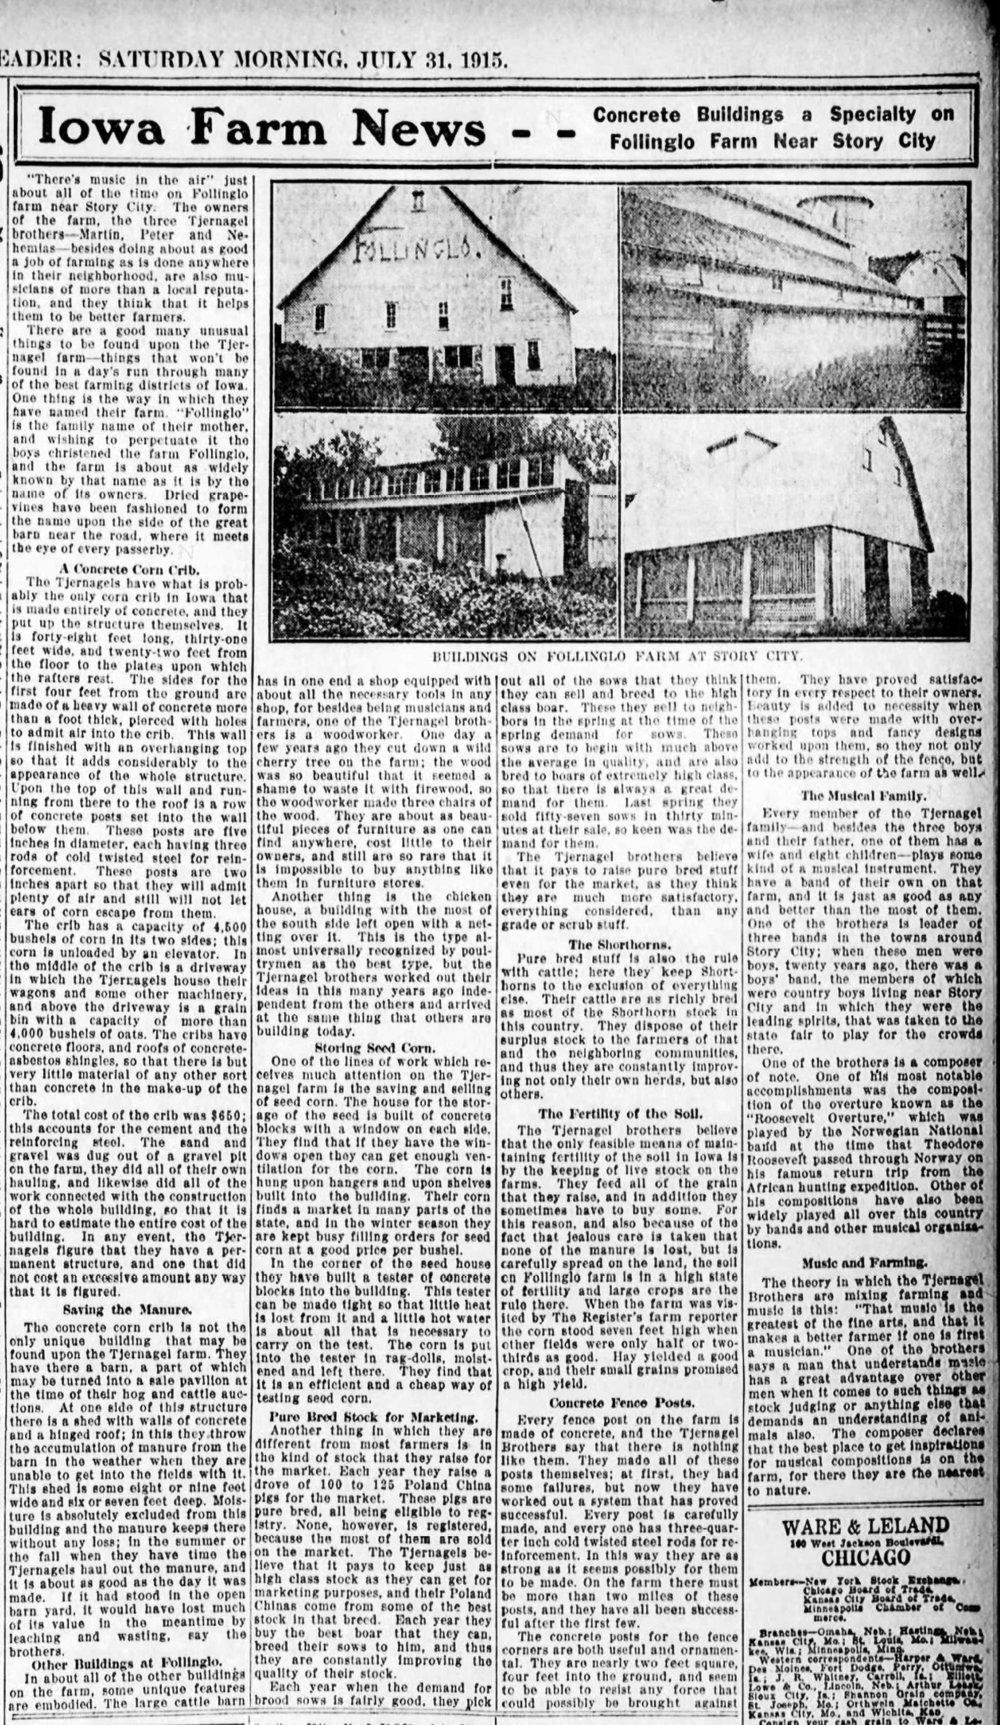 Des Moines Register  story on Follinglo Farm, July 31, 1915, p.10